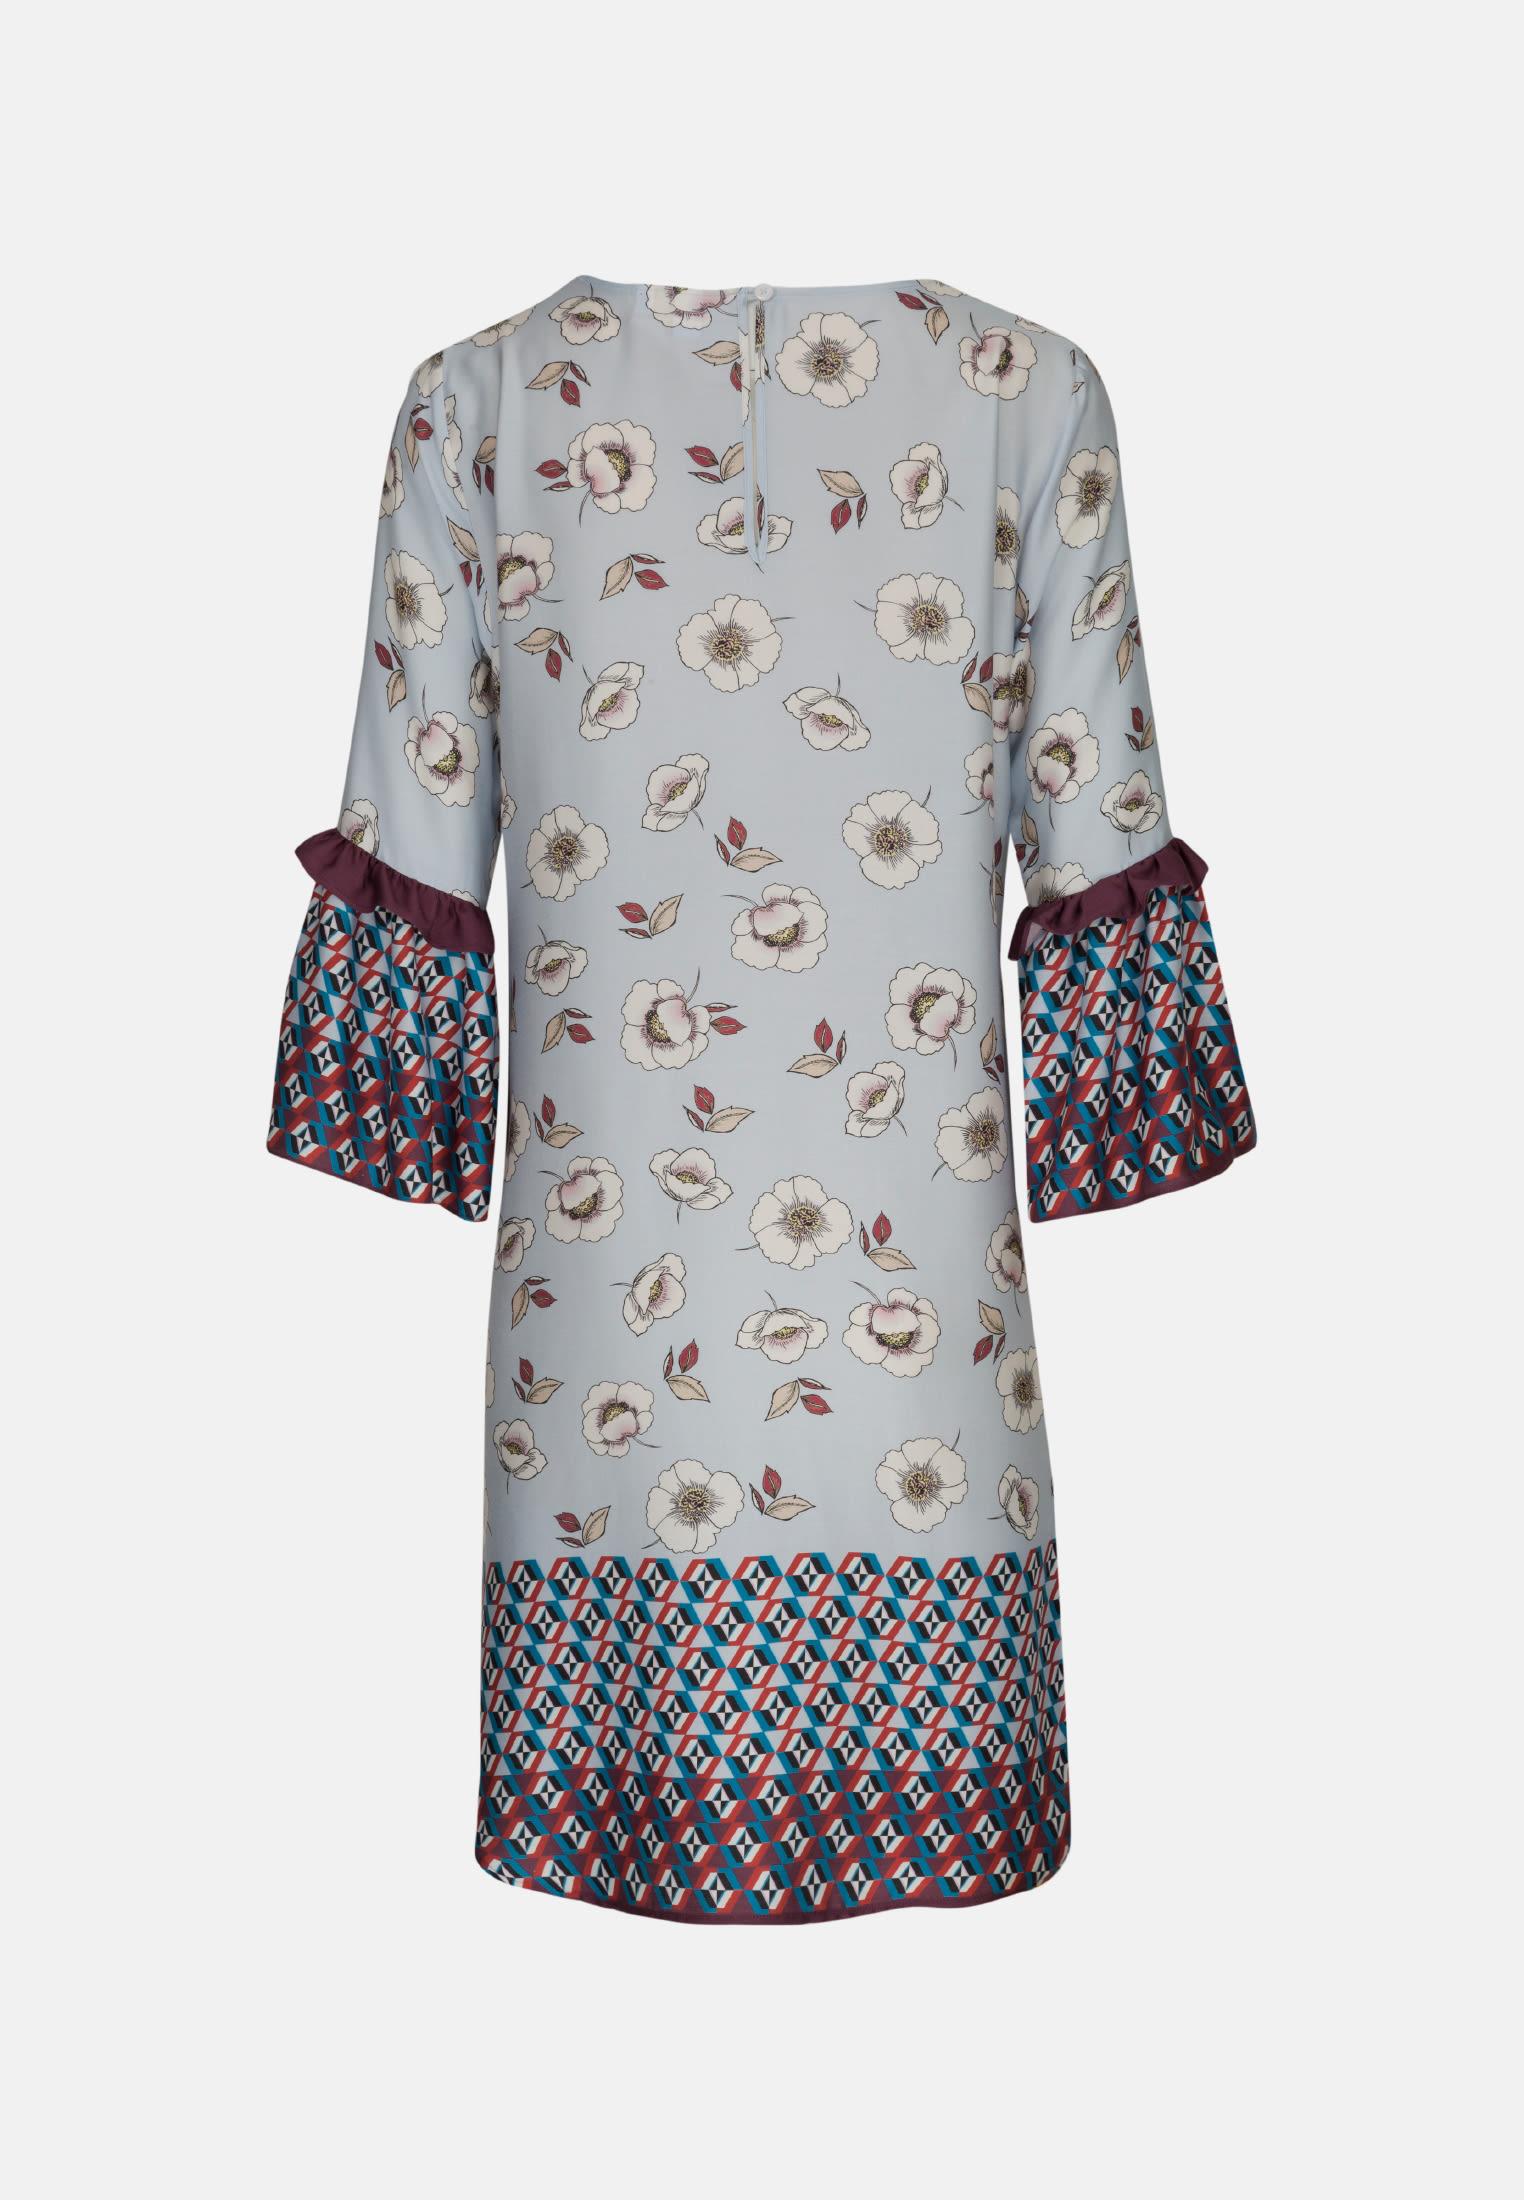 3/4 sleeve Satin Shirt Blouse aus 100% Viscose in Light blue |  Seidensticker Onlineshop